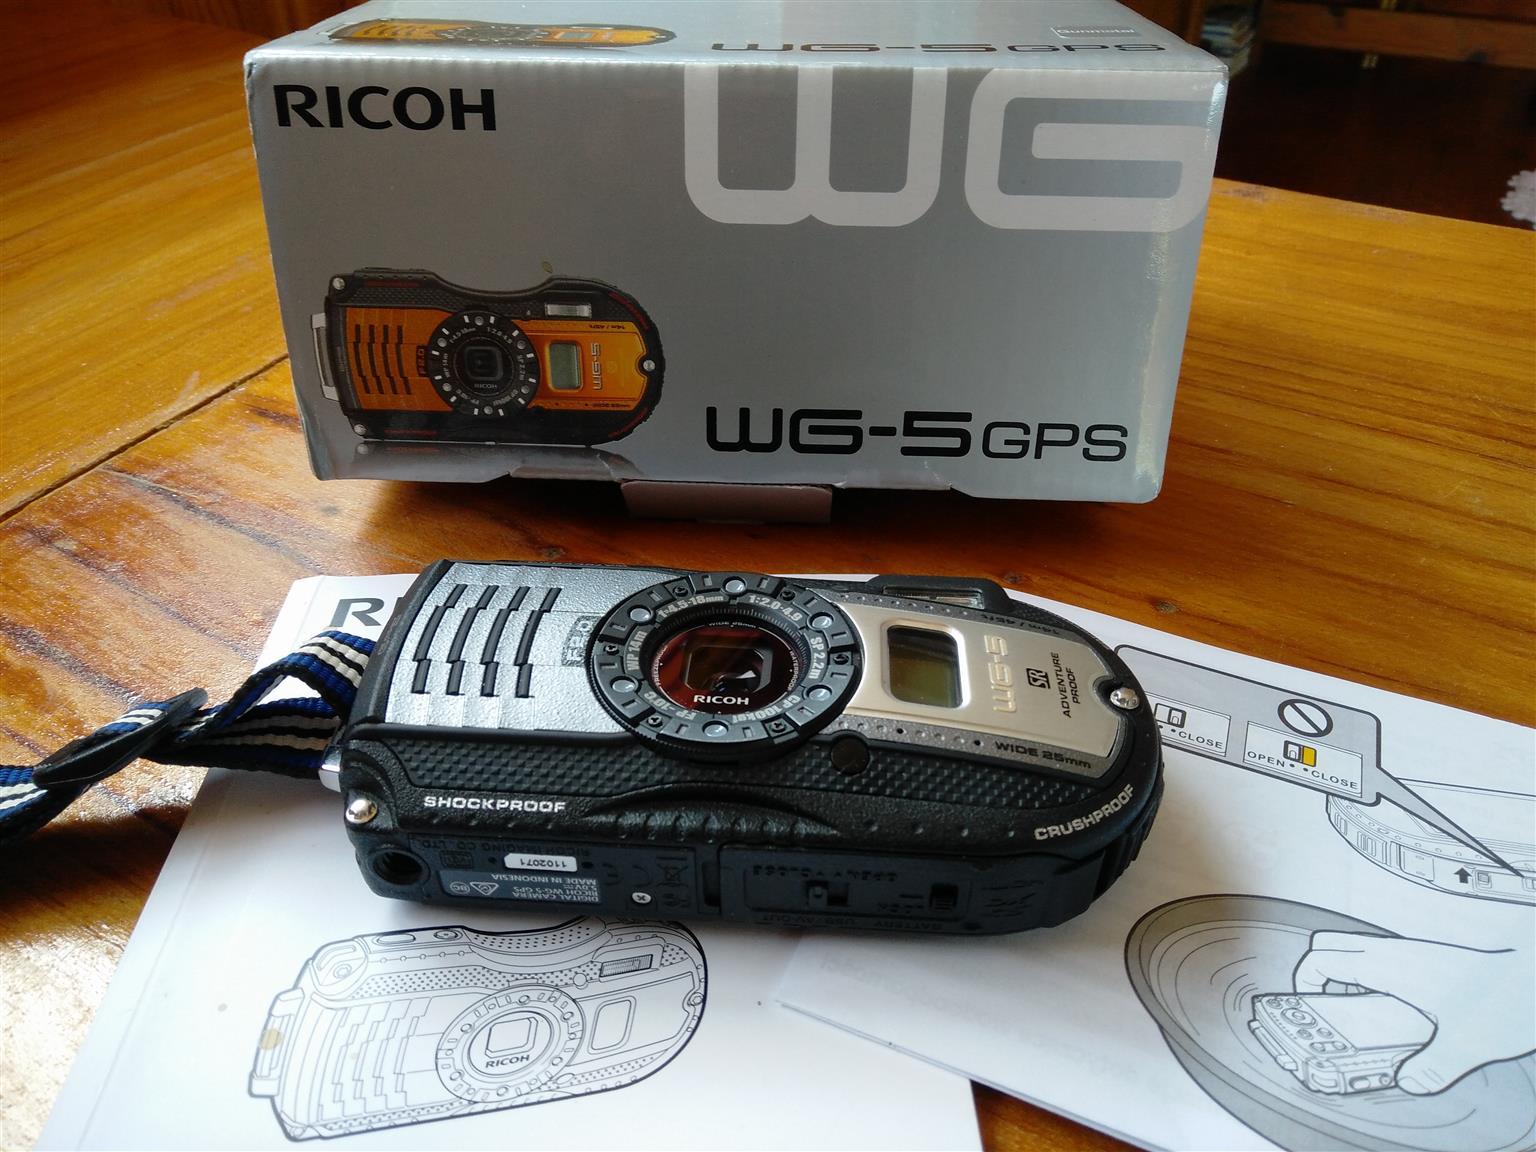 Ricoh WG-5 compact camera